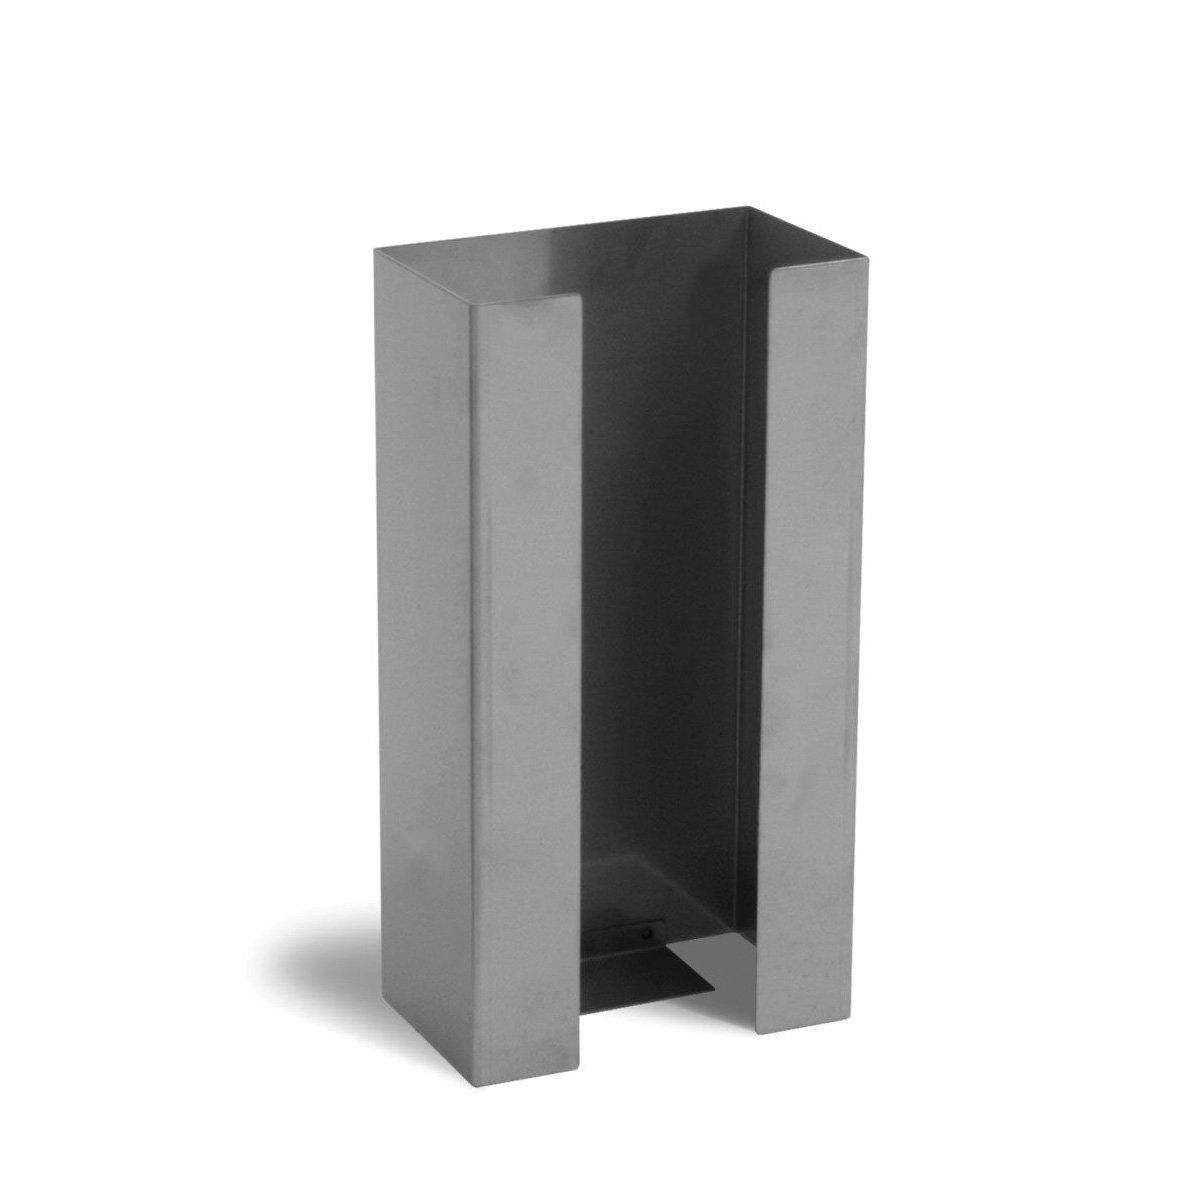 UltraSource Stainless Steel Glove Box Dispenser, 1 Box Capacity